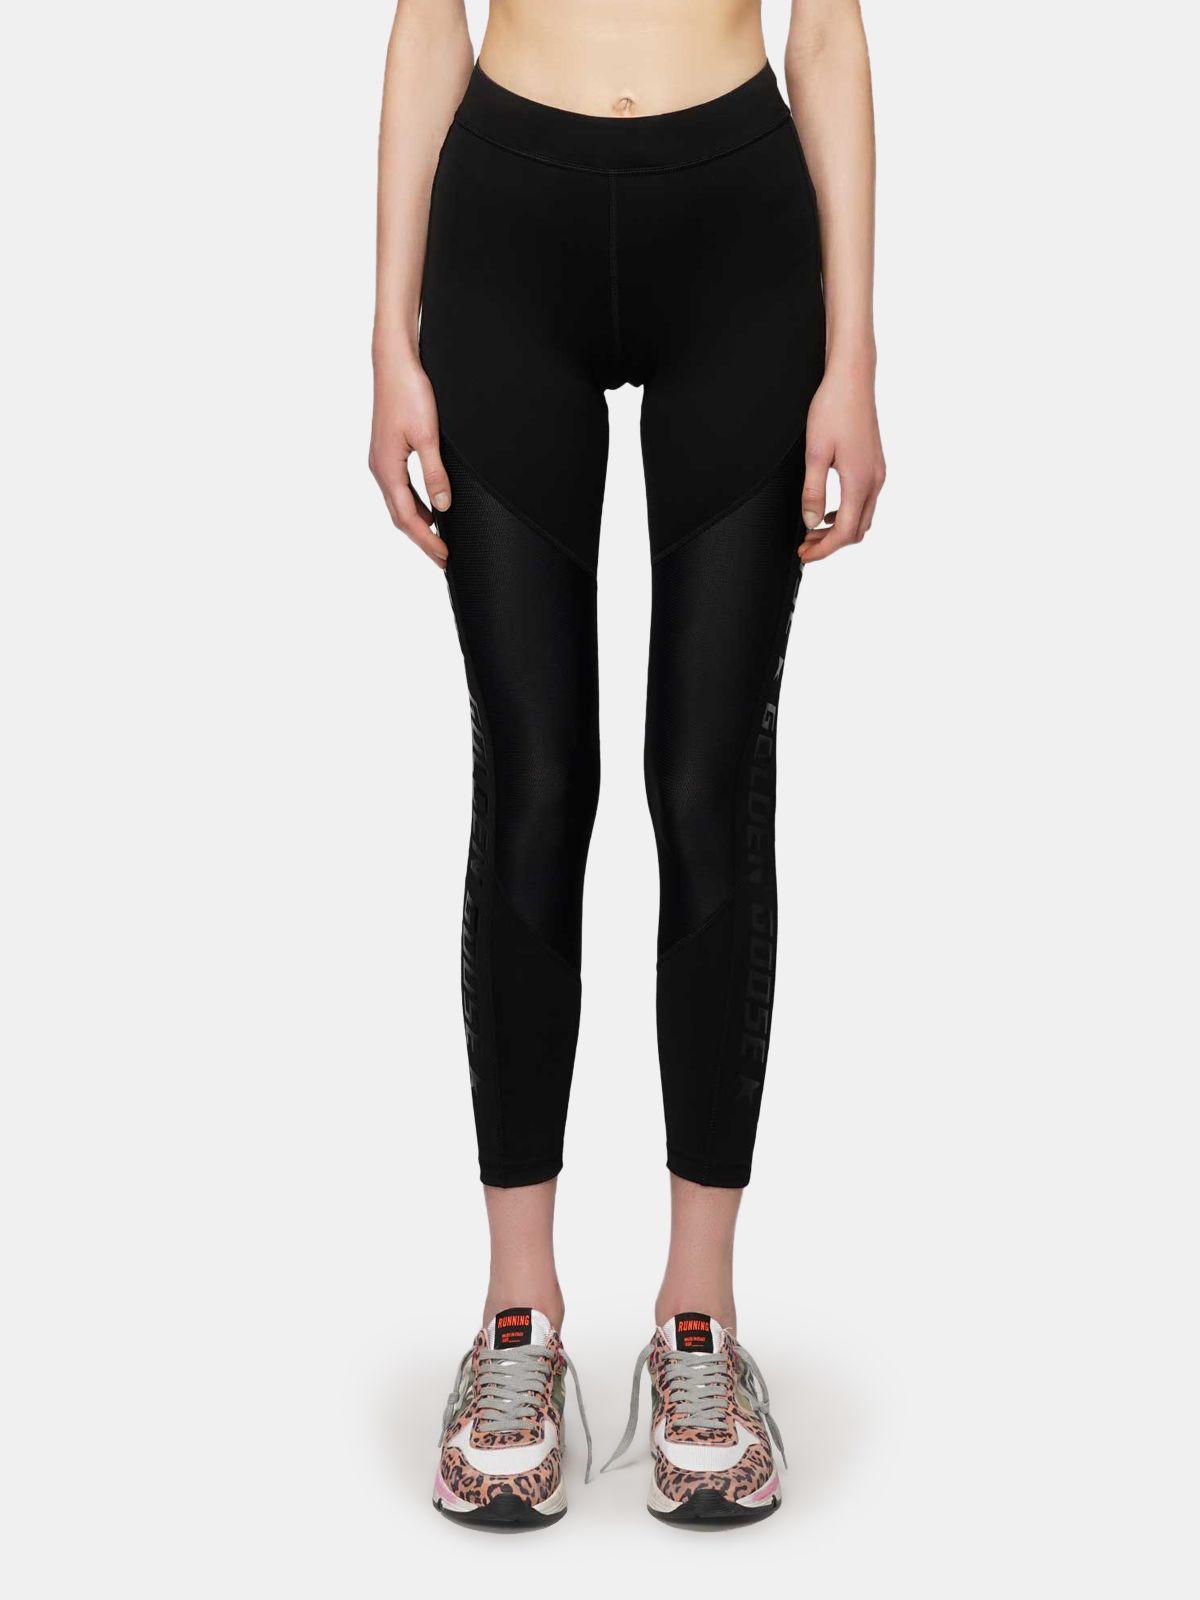 Golden Goose - Black Nori leggings in technical fabric and mesh in